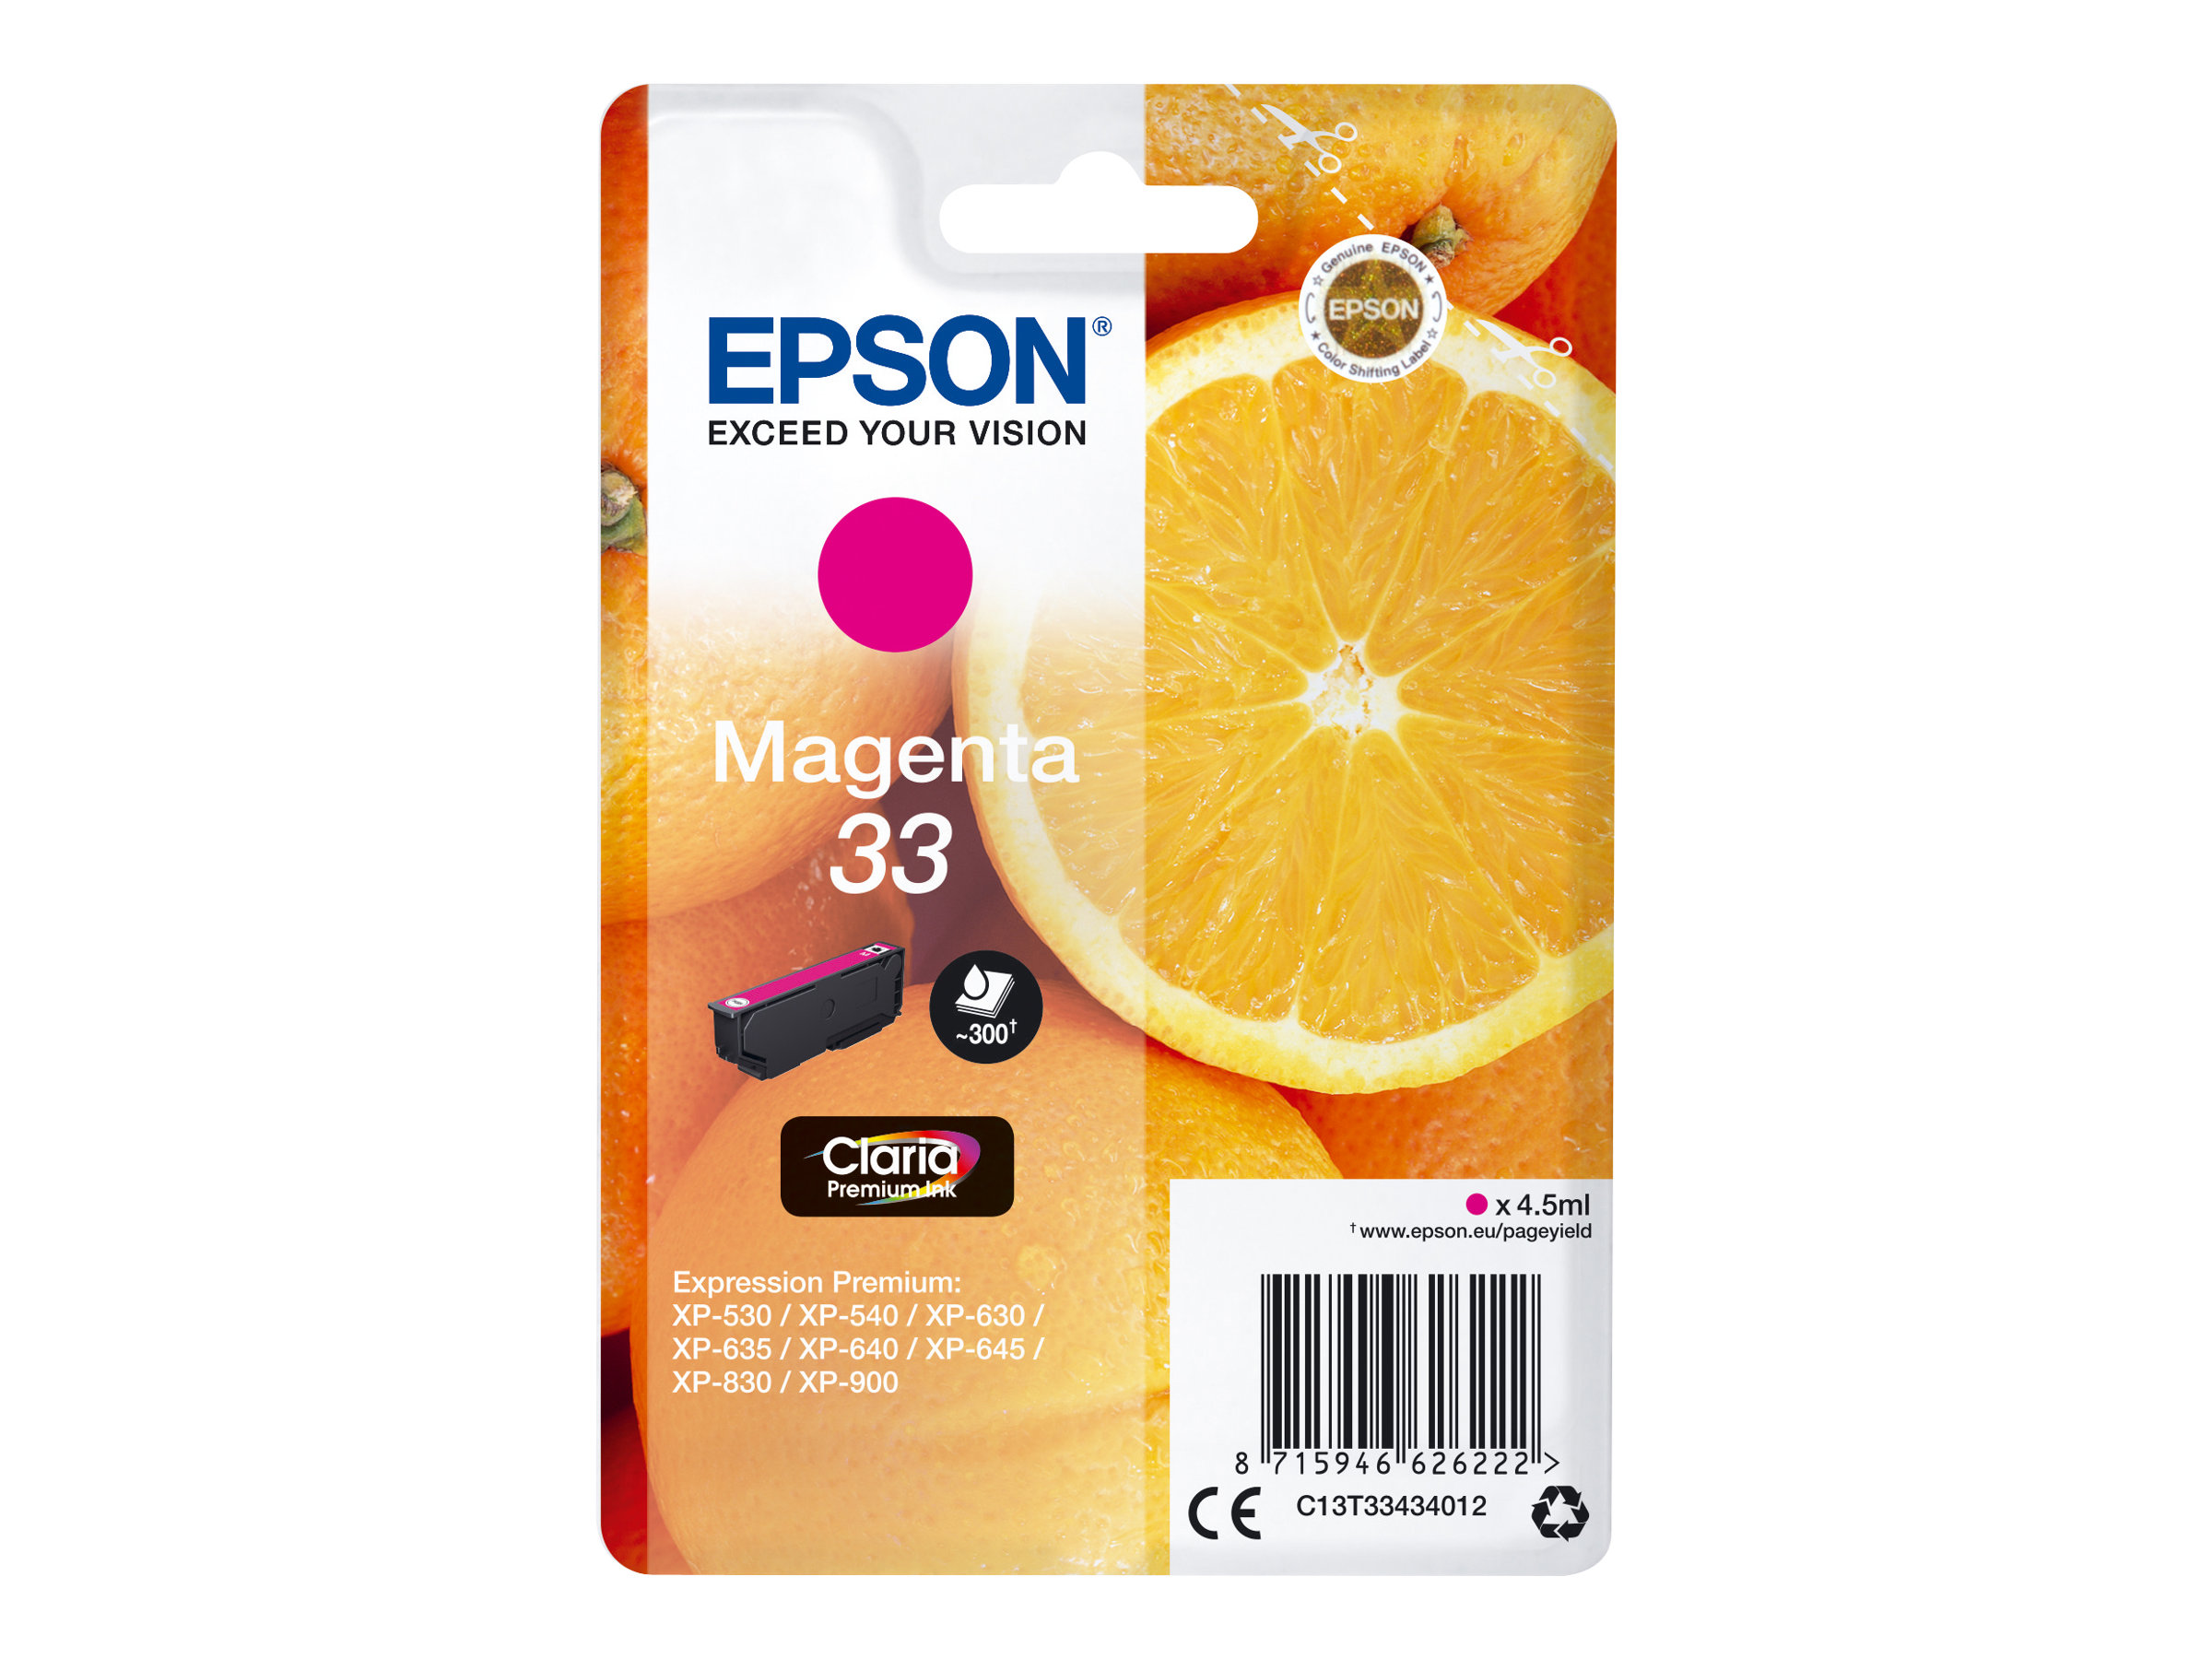 Epson 33 Oranges - magenta - cartouche d'encre originale